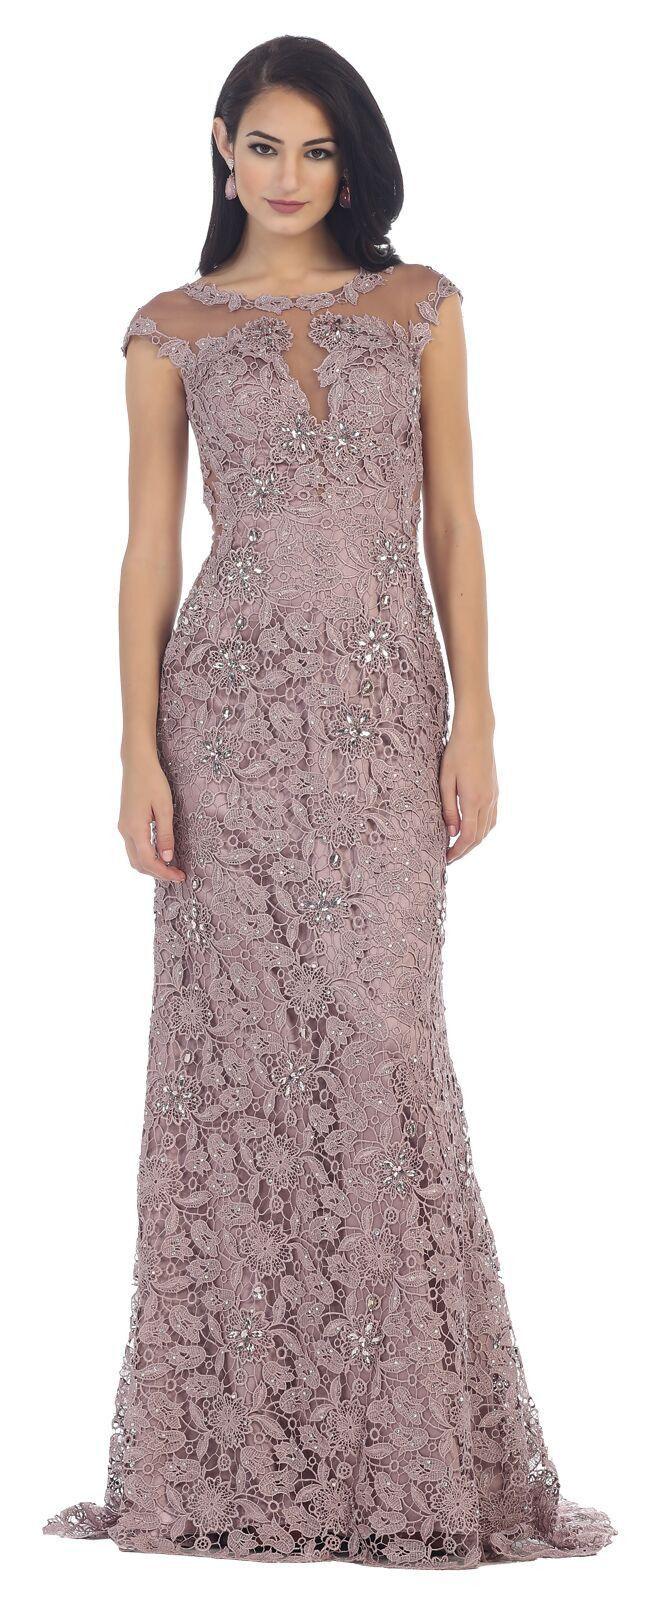 Long formal dress plus size evening gown pinterest evening